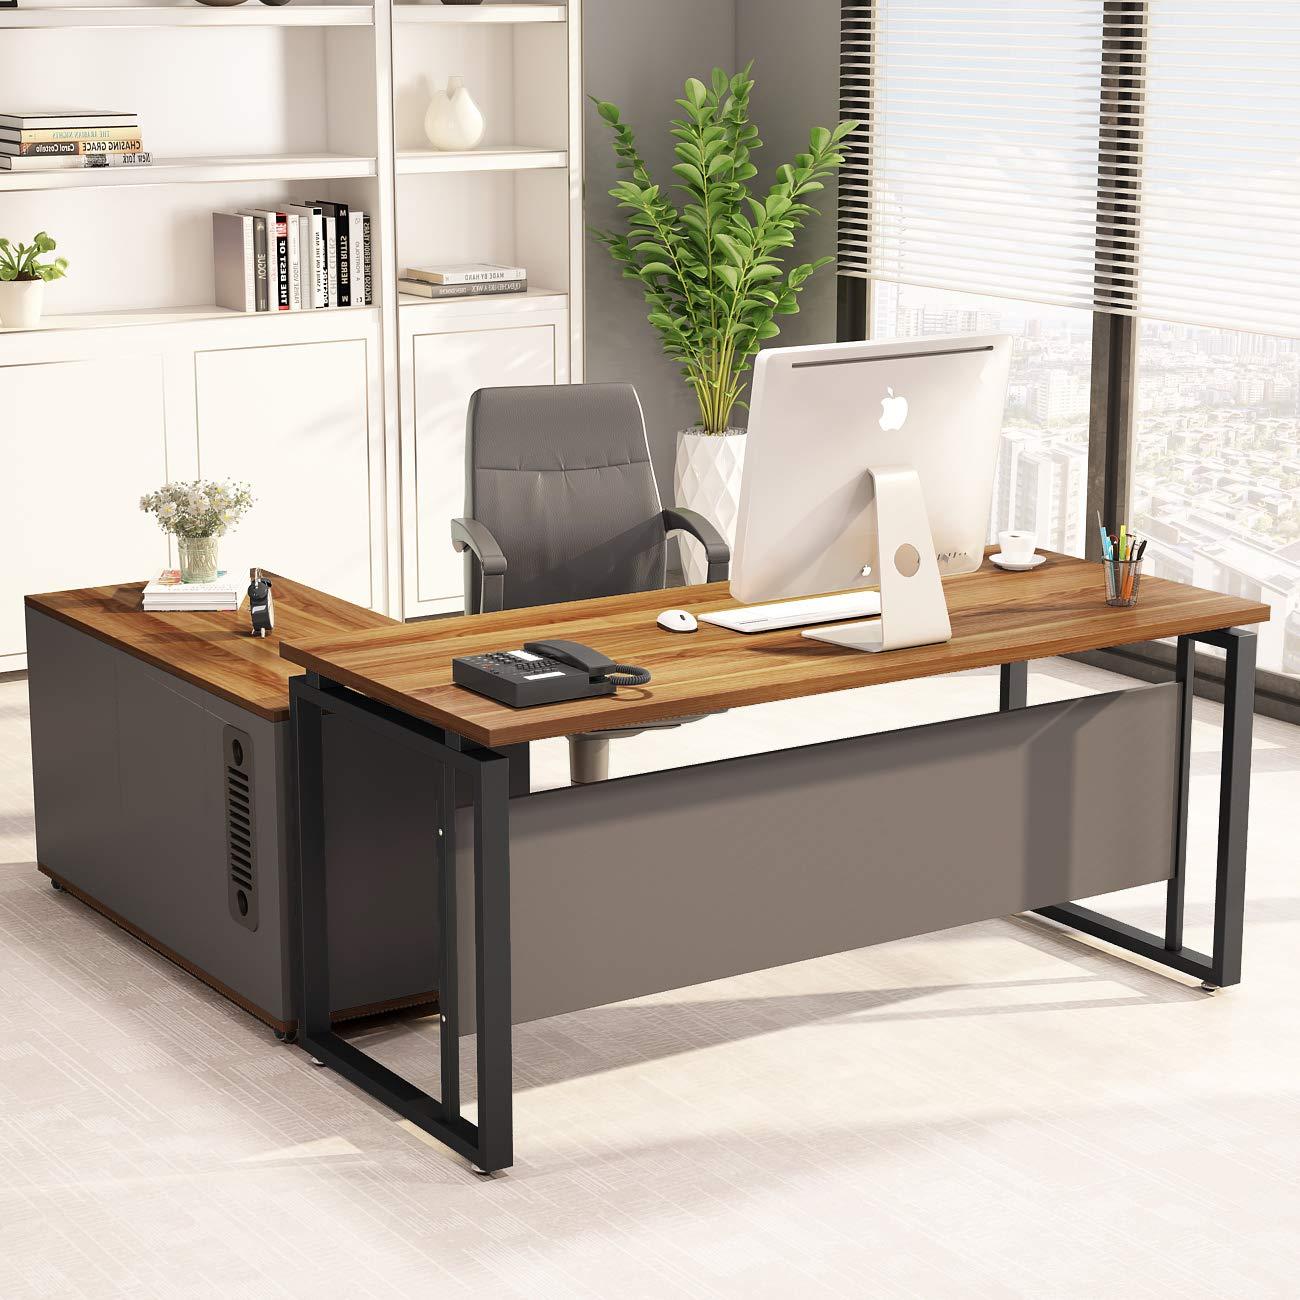 "LITTLE TREE L-Shaped Computer Desk, 55'' Executive Desk Business Furniture with 39"" File Cabinet Storage Mobile Printer Filing Stand for Office (Dark Walnut)"